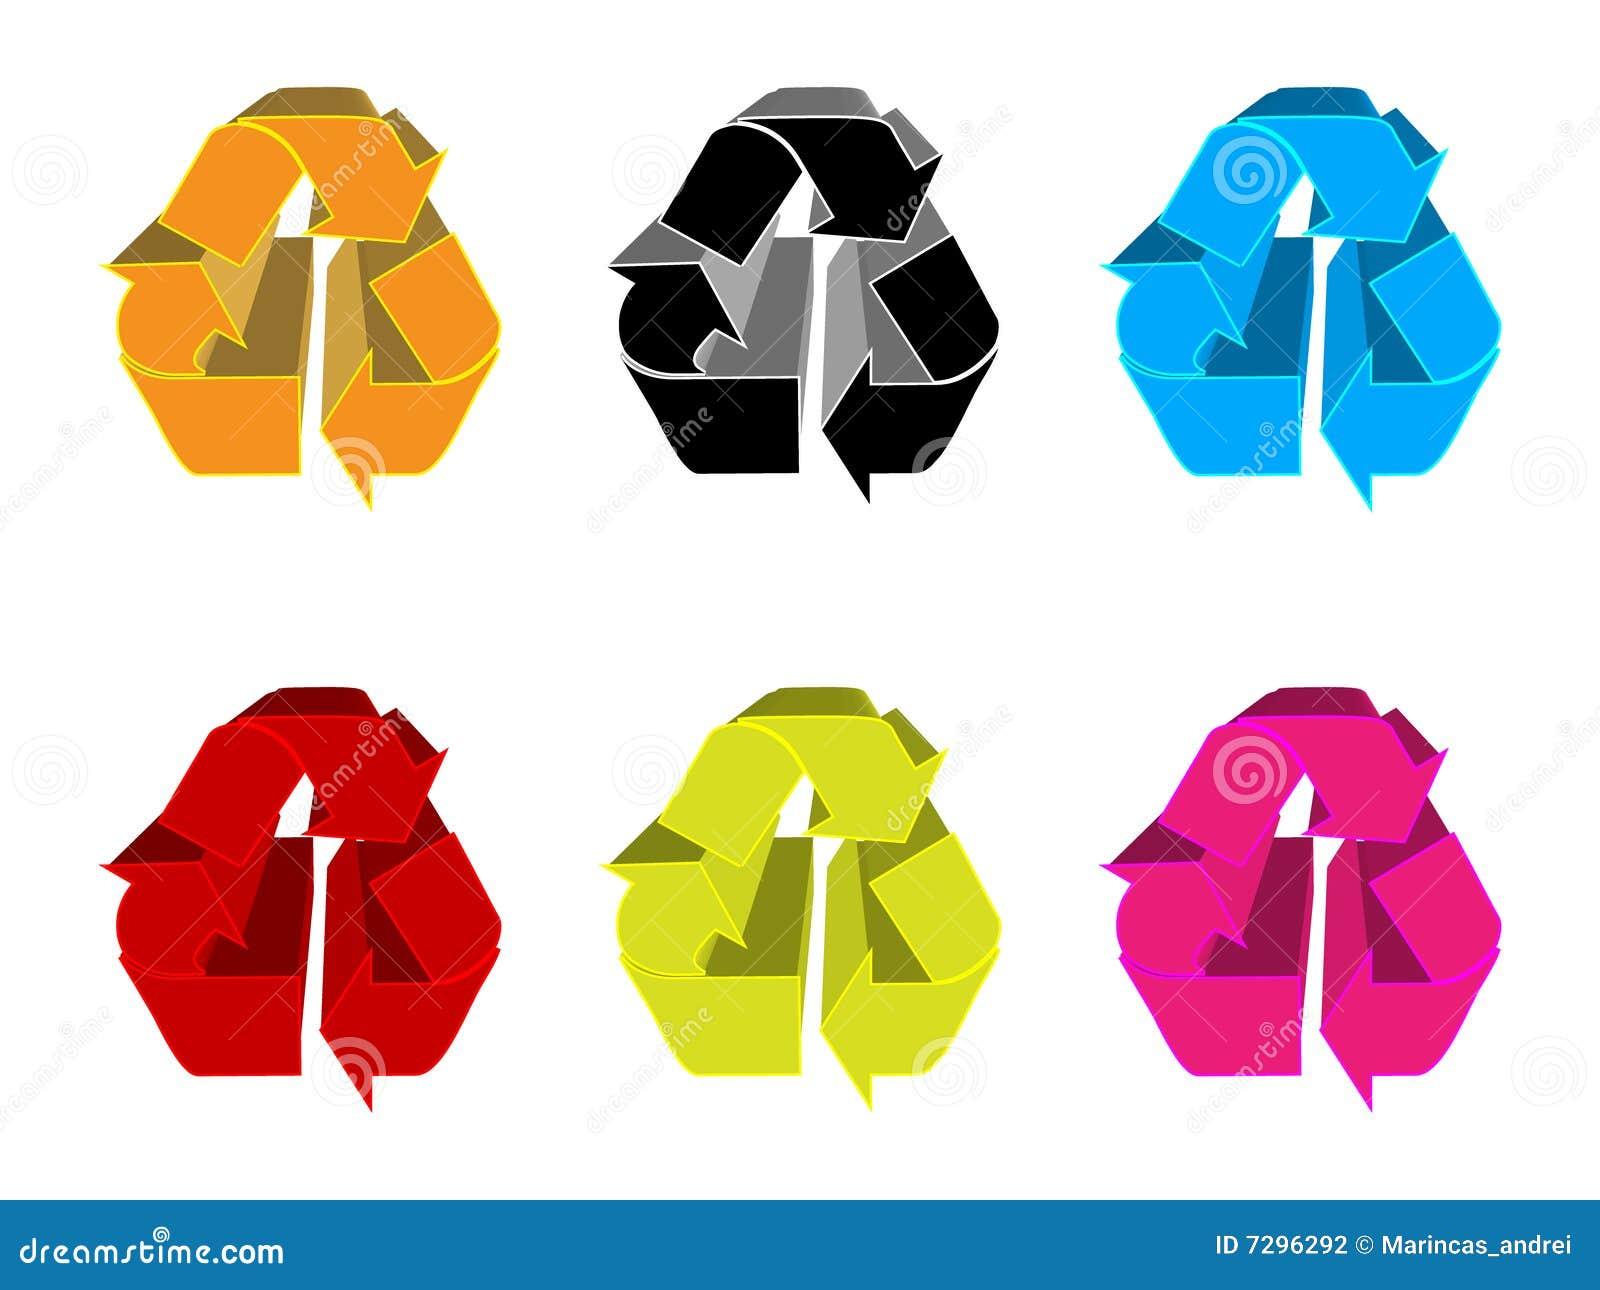 Recycling symbols stock photography image 7296292 - Colores para reciclar ...